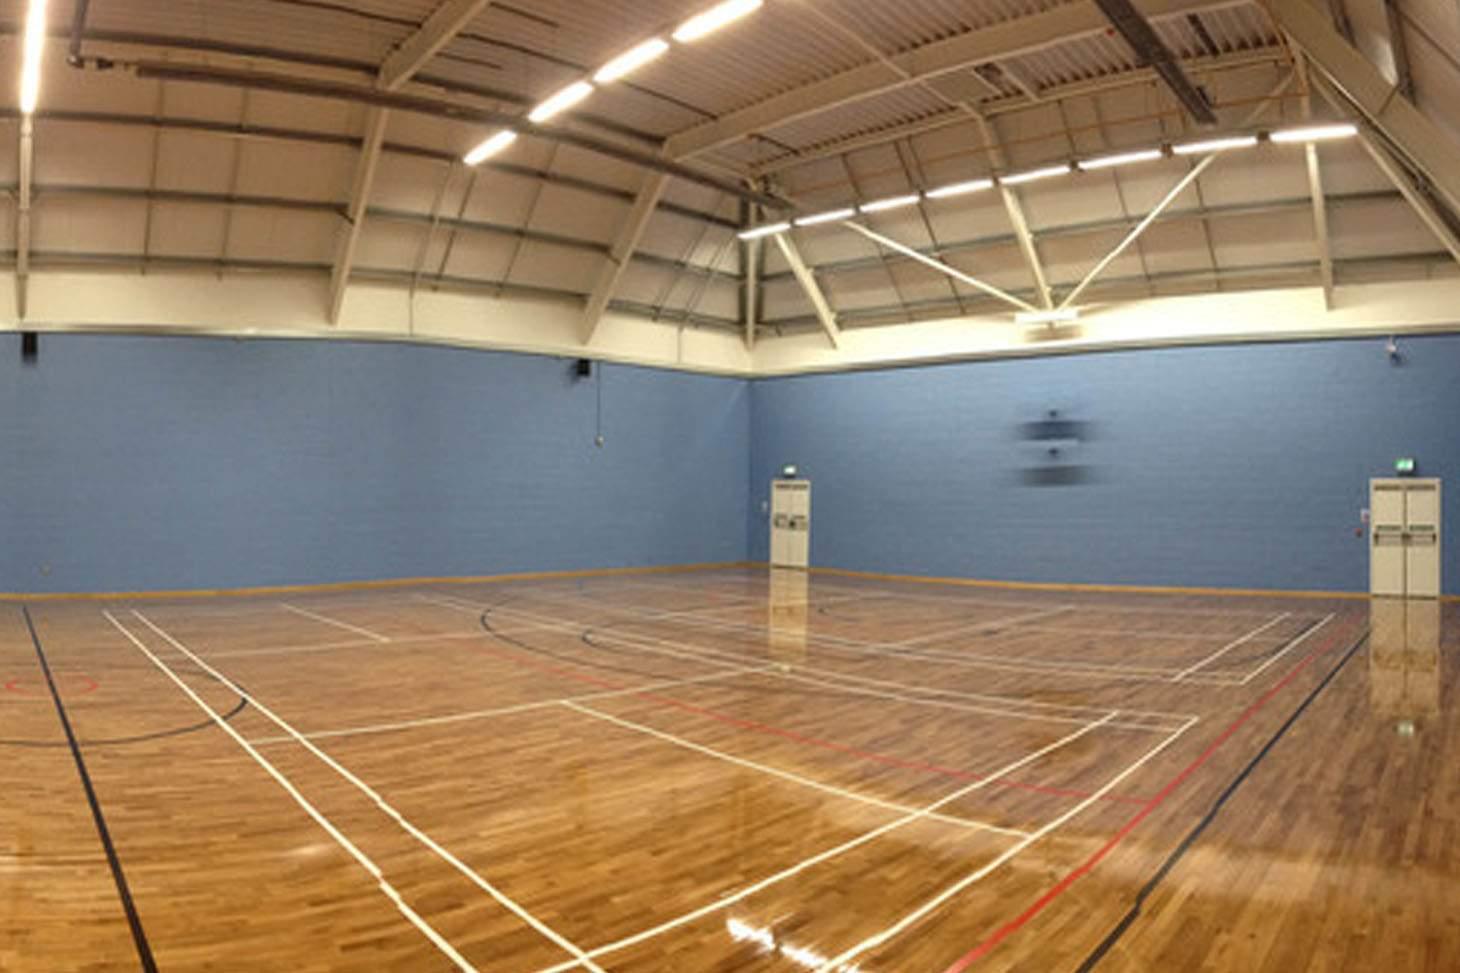 Sutton Coldfield Grammar School for Girls 5 a side | Indoor football pitch